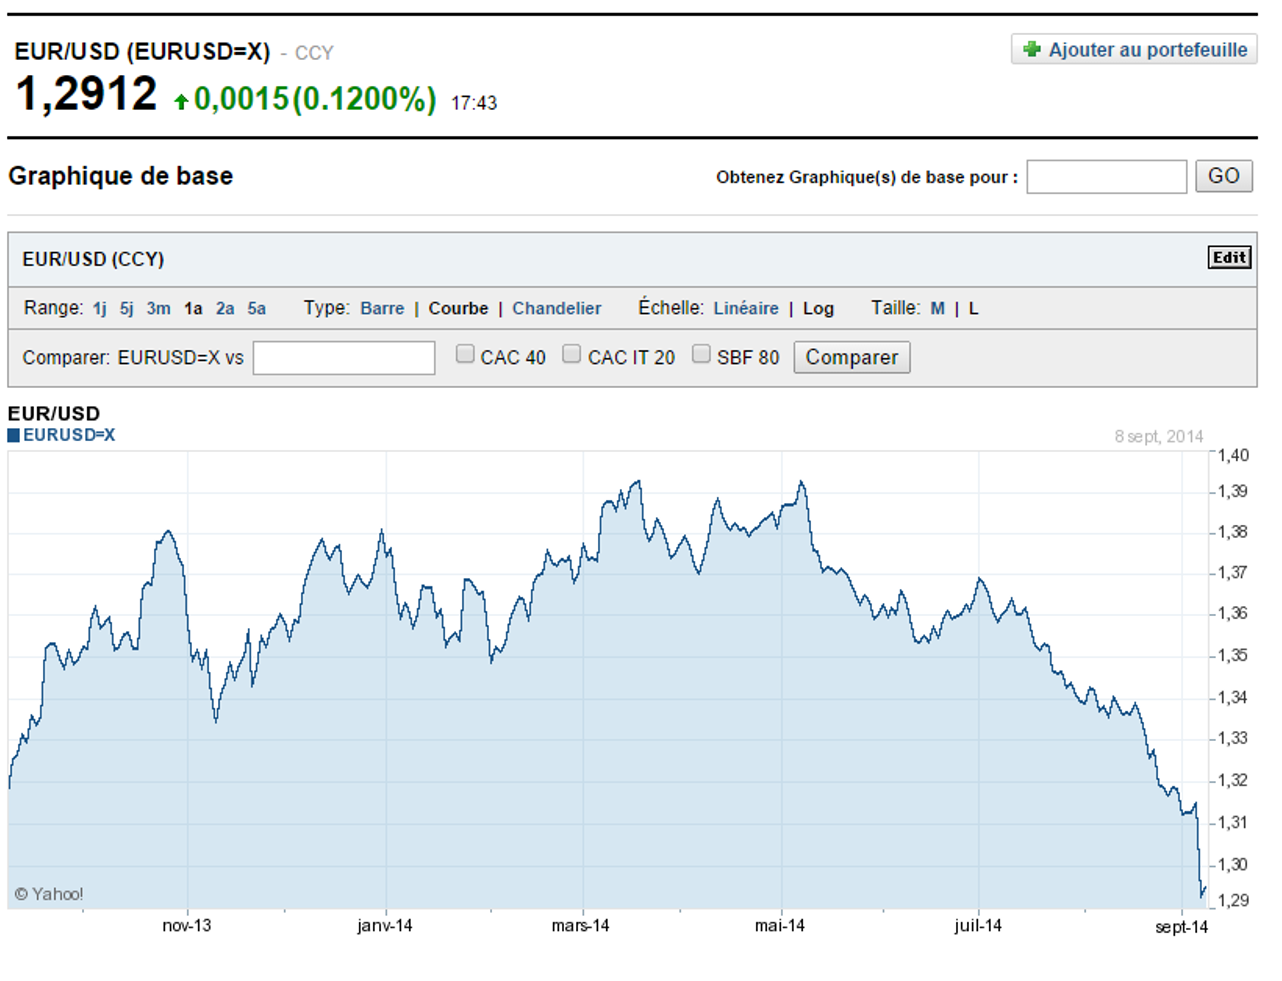 Cours Euro Dollar sept 2014 depuis 1 an